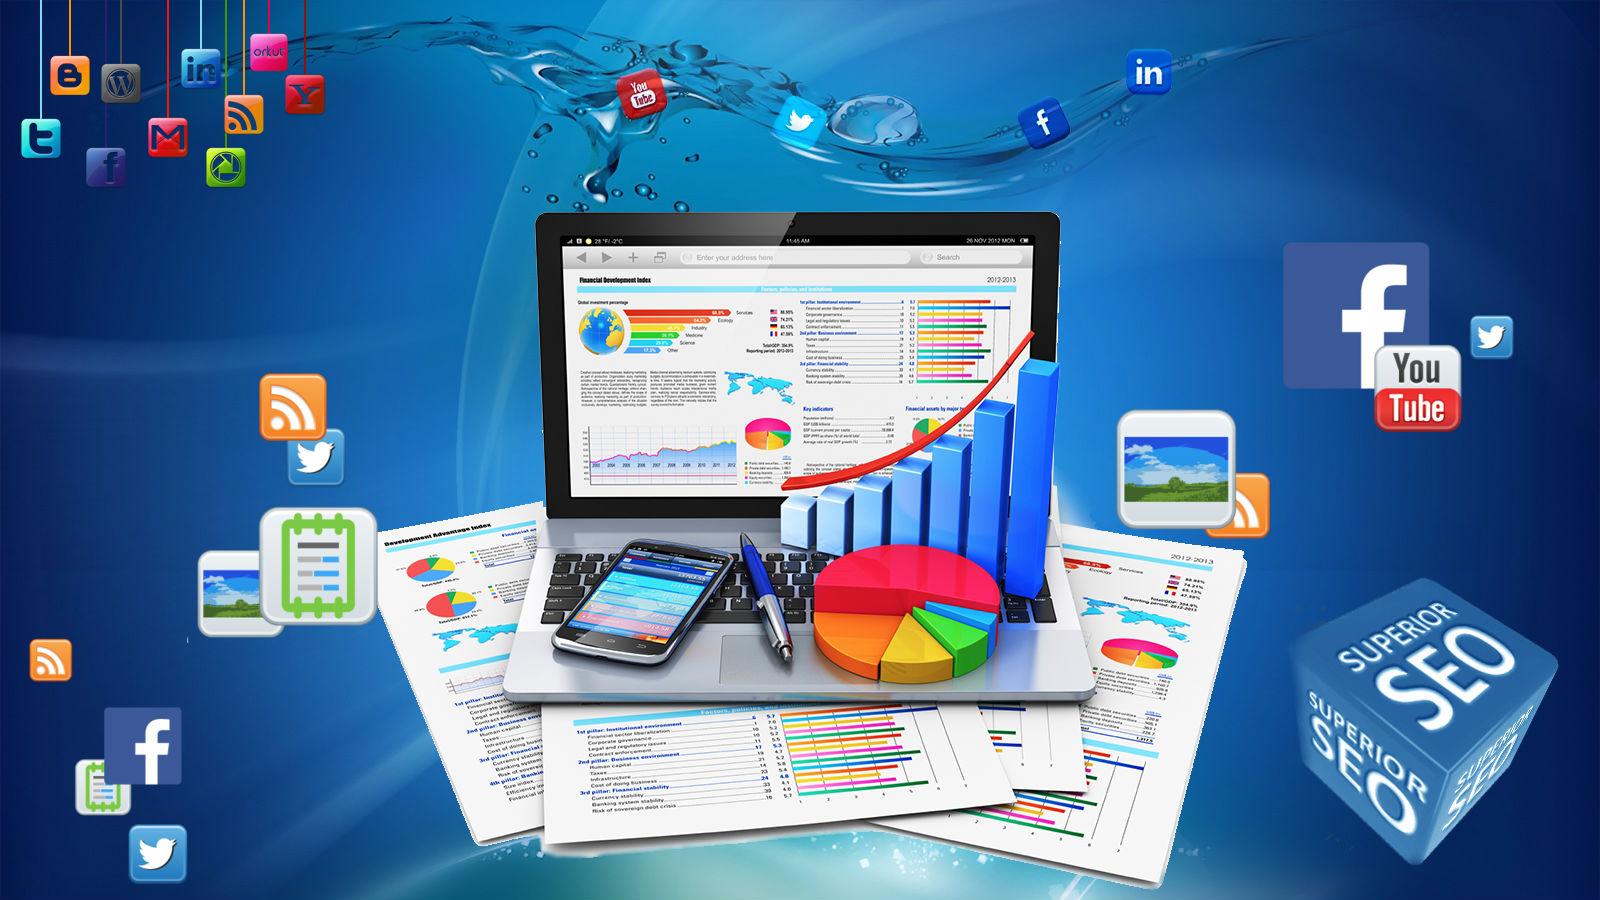 digitalmarketing - Mengapa Strategi Digital Marketing Penting Untuk Meningkatkan Perkembangan Startup?